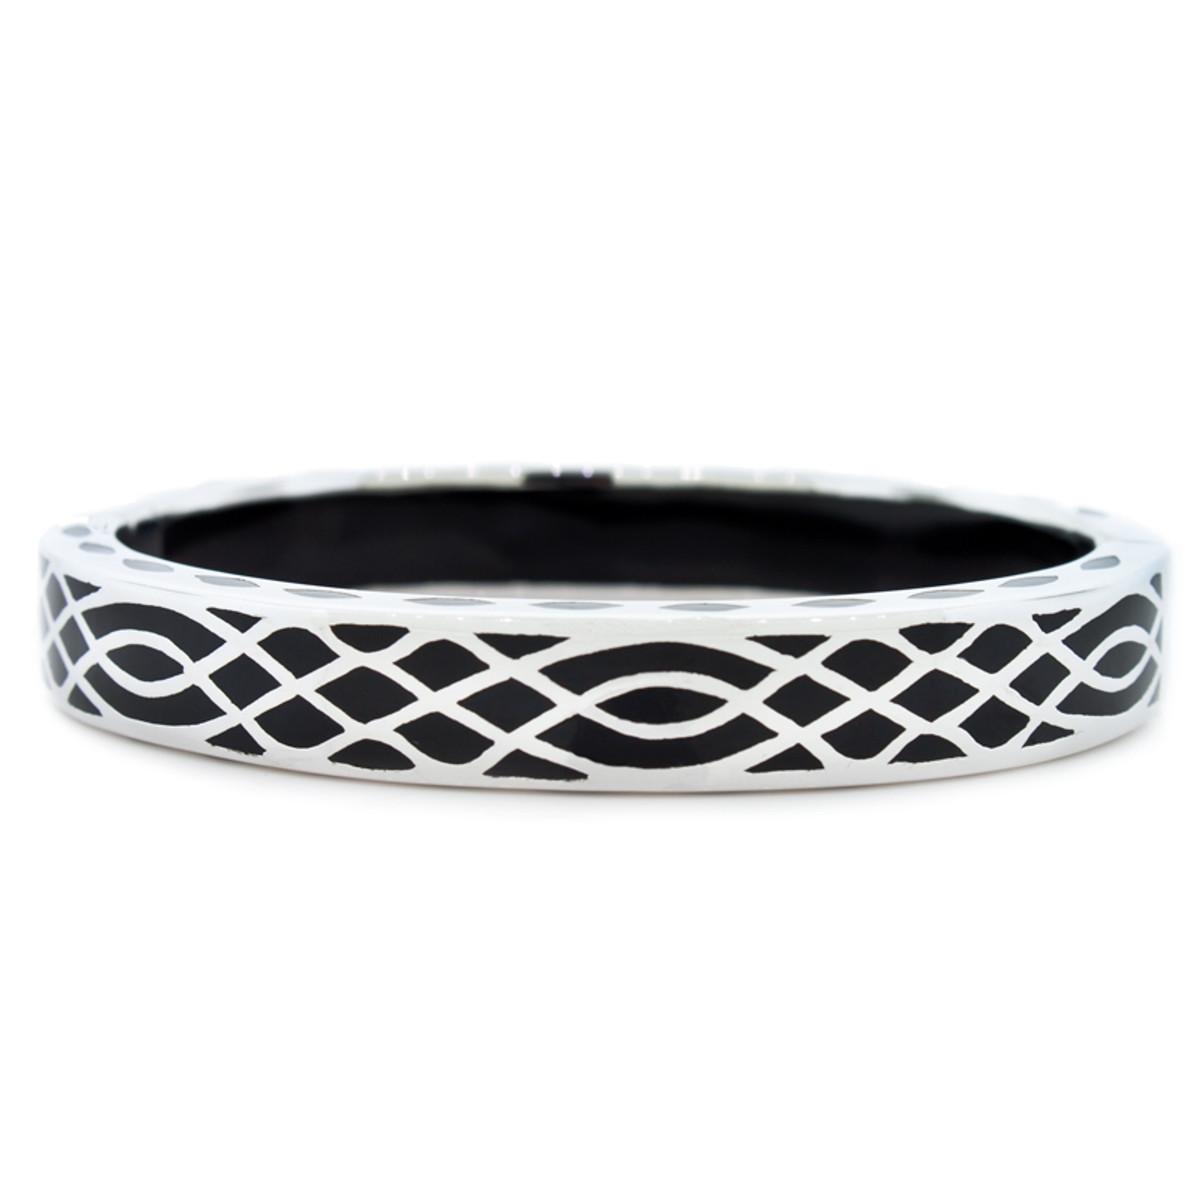 Andrew Hamilton Crawford Black Infinity Black and Silver Bracelet